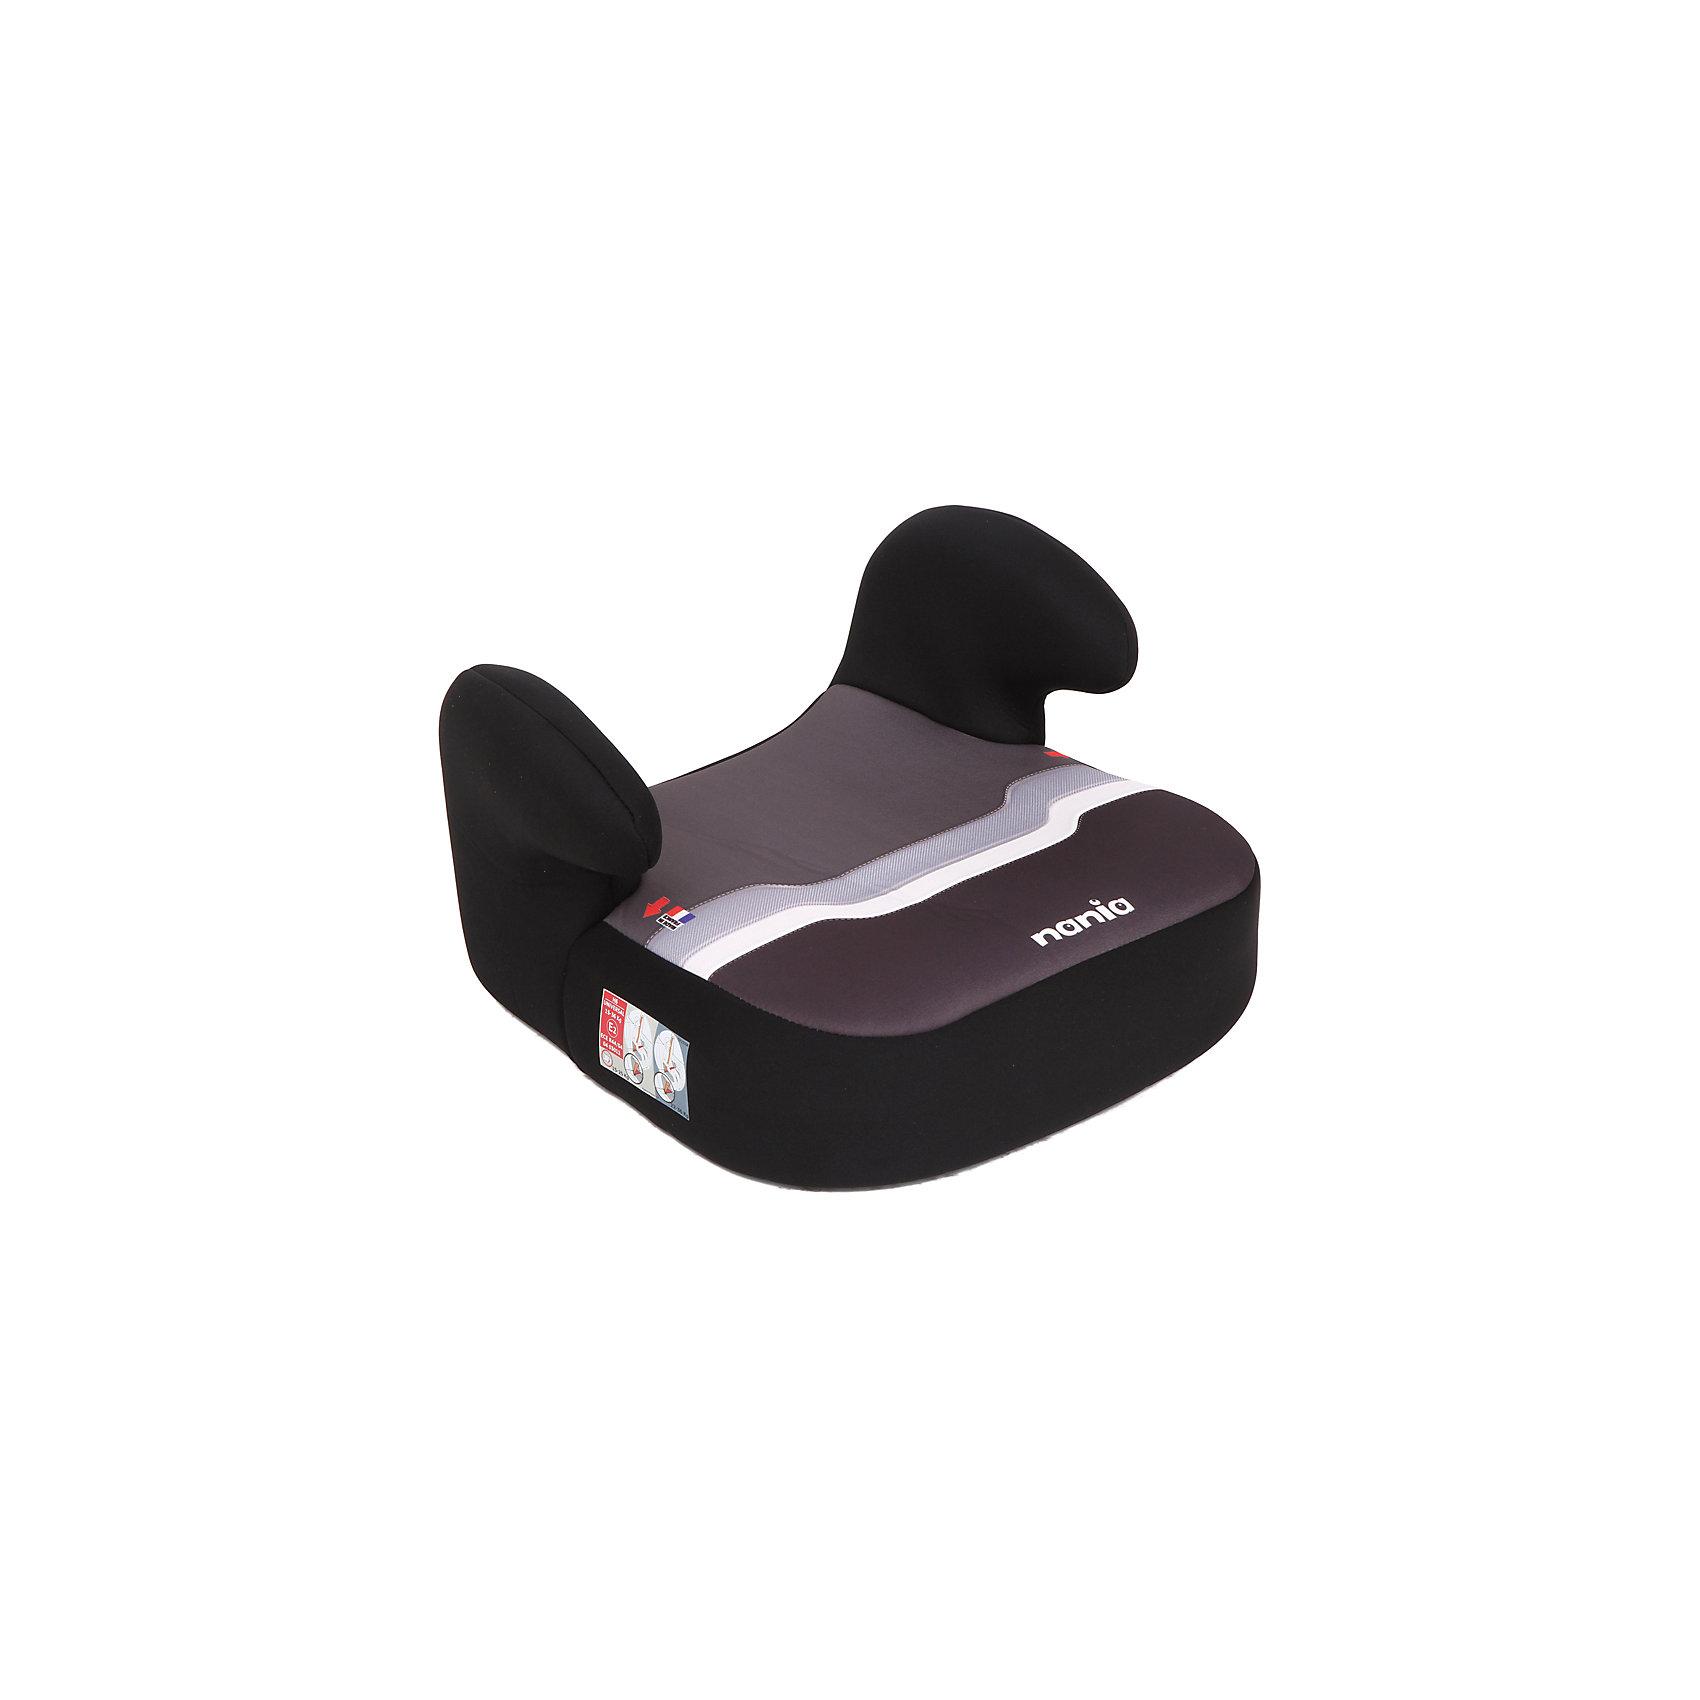 Автокресло-бустер Dream, 15-36 кг., Nania, Horizon Black